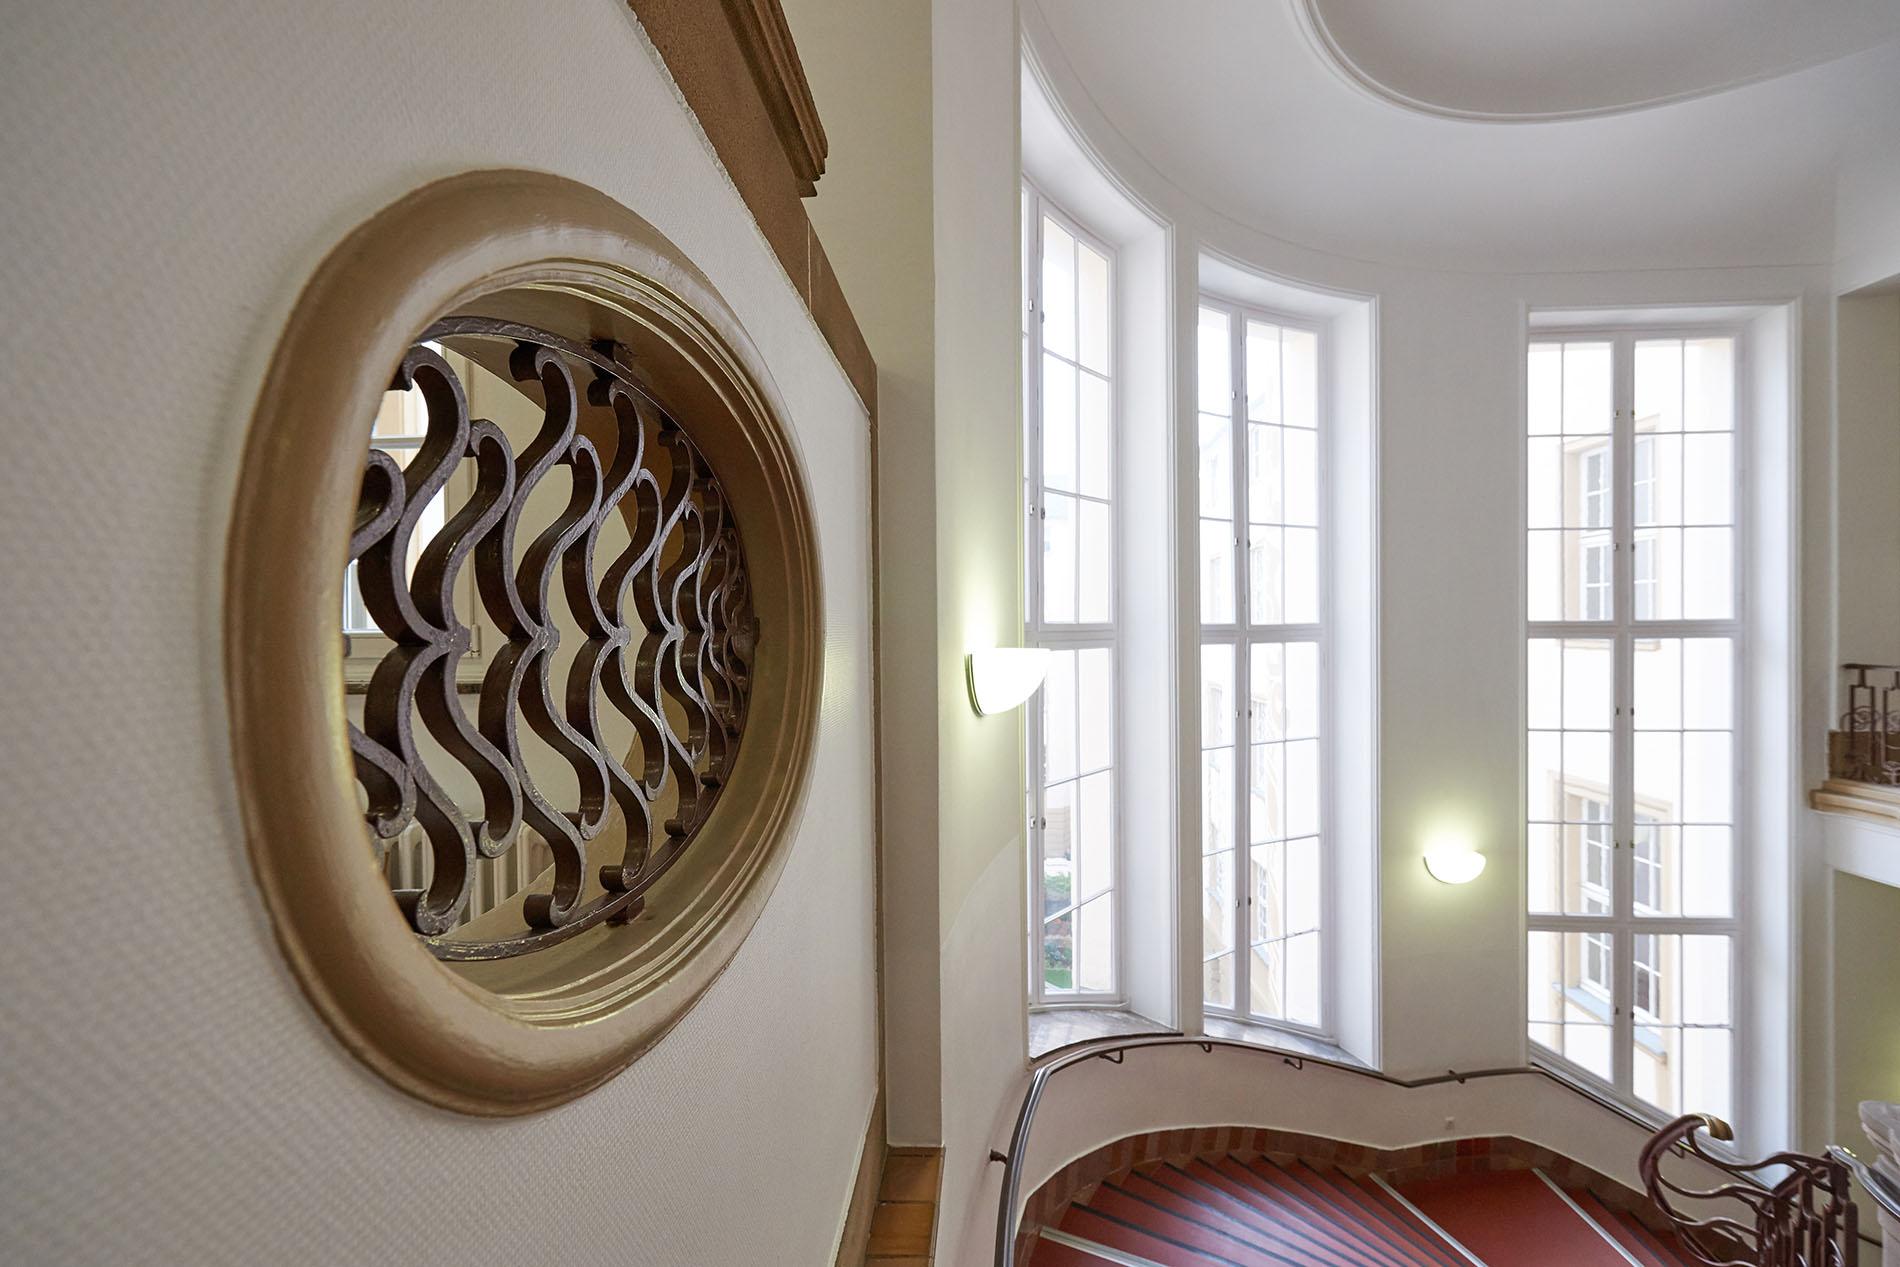 Fotodesign-matthias-schuetz-Duisburg-Fenster